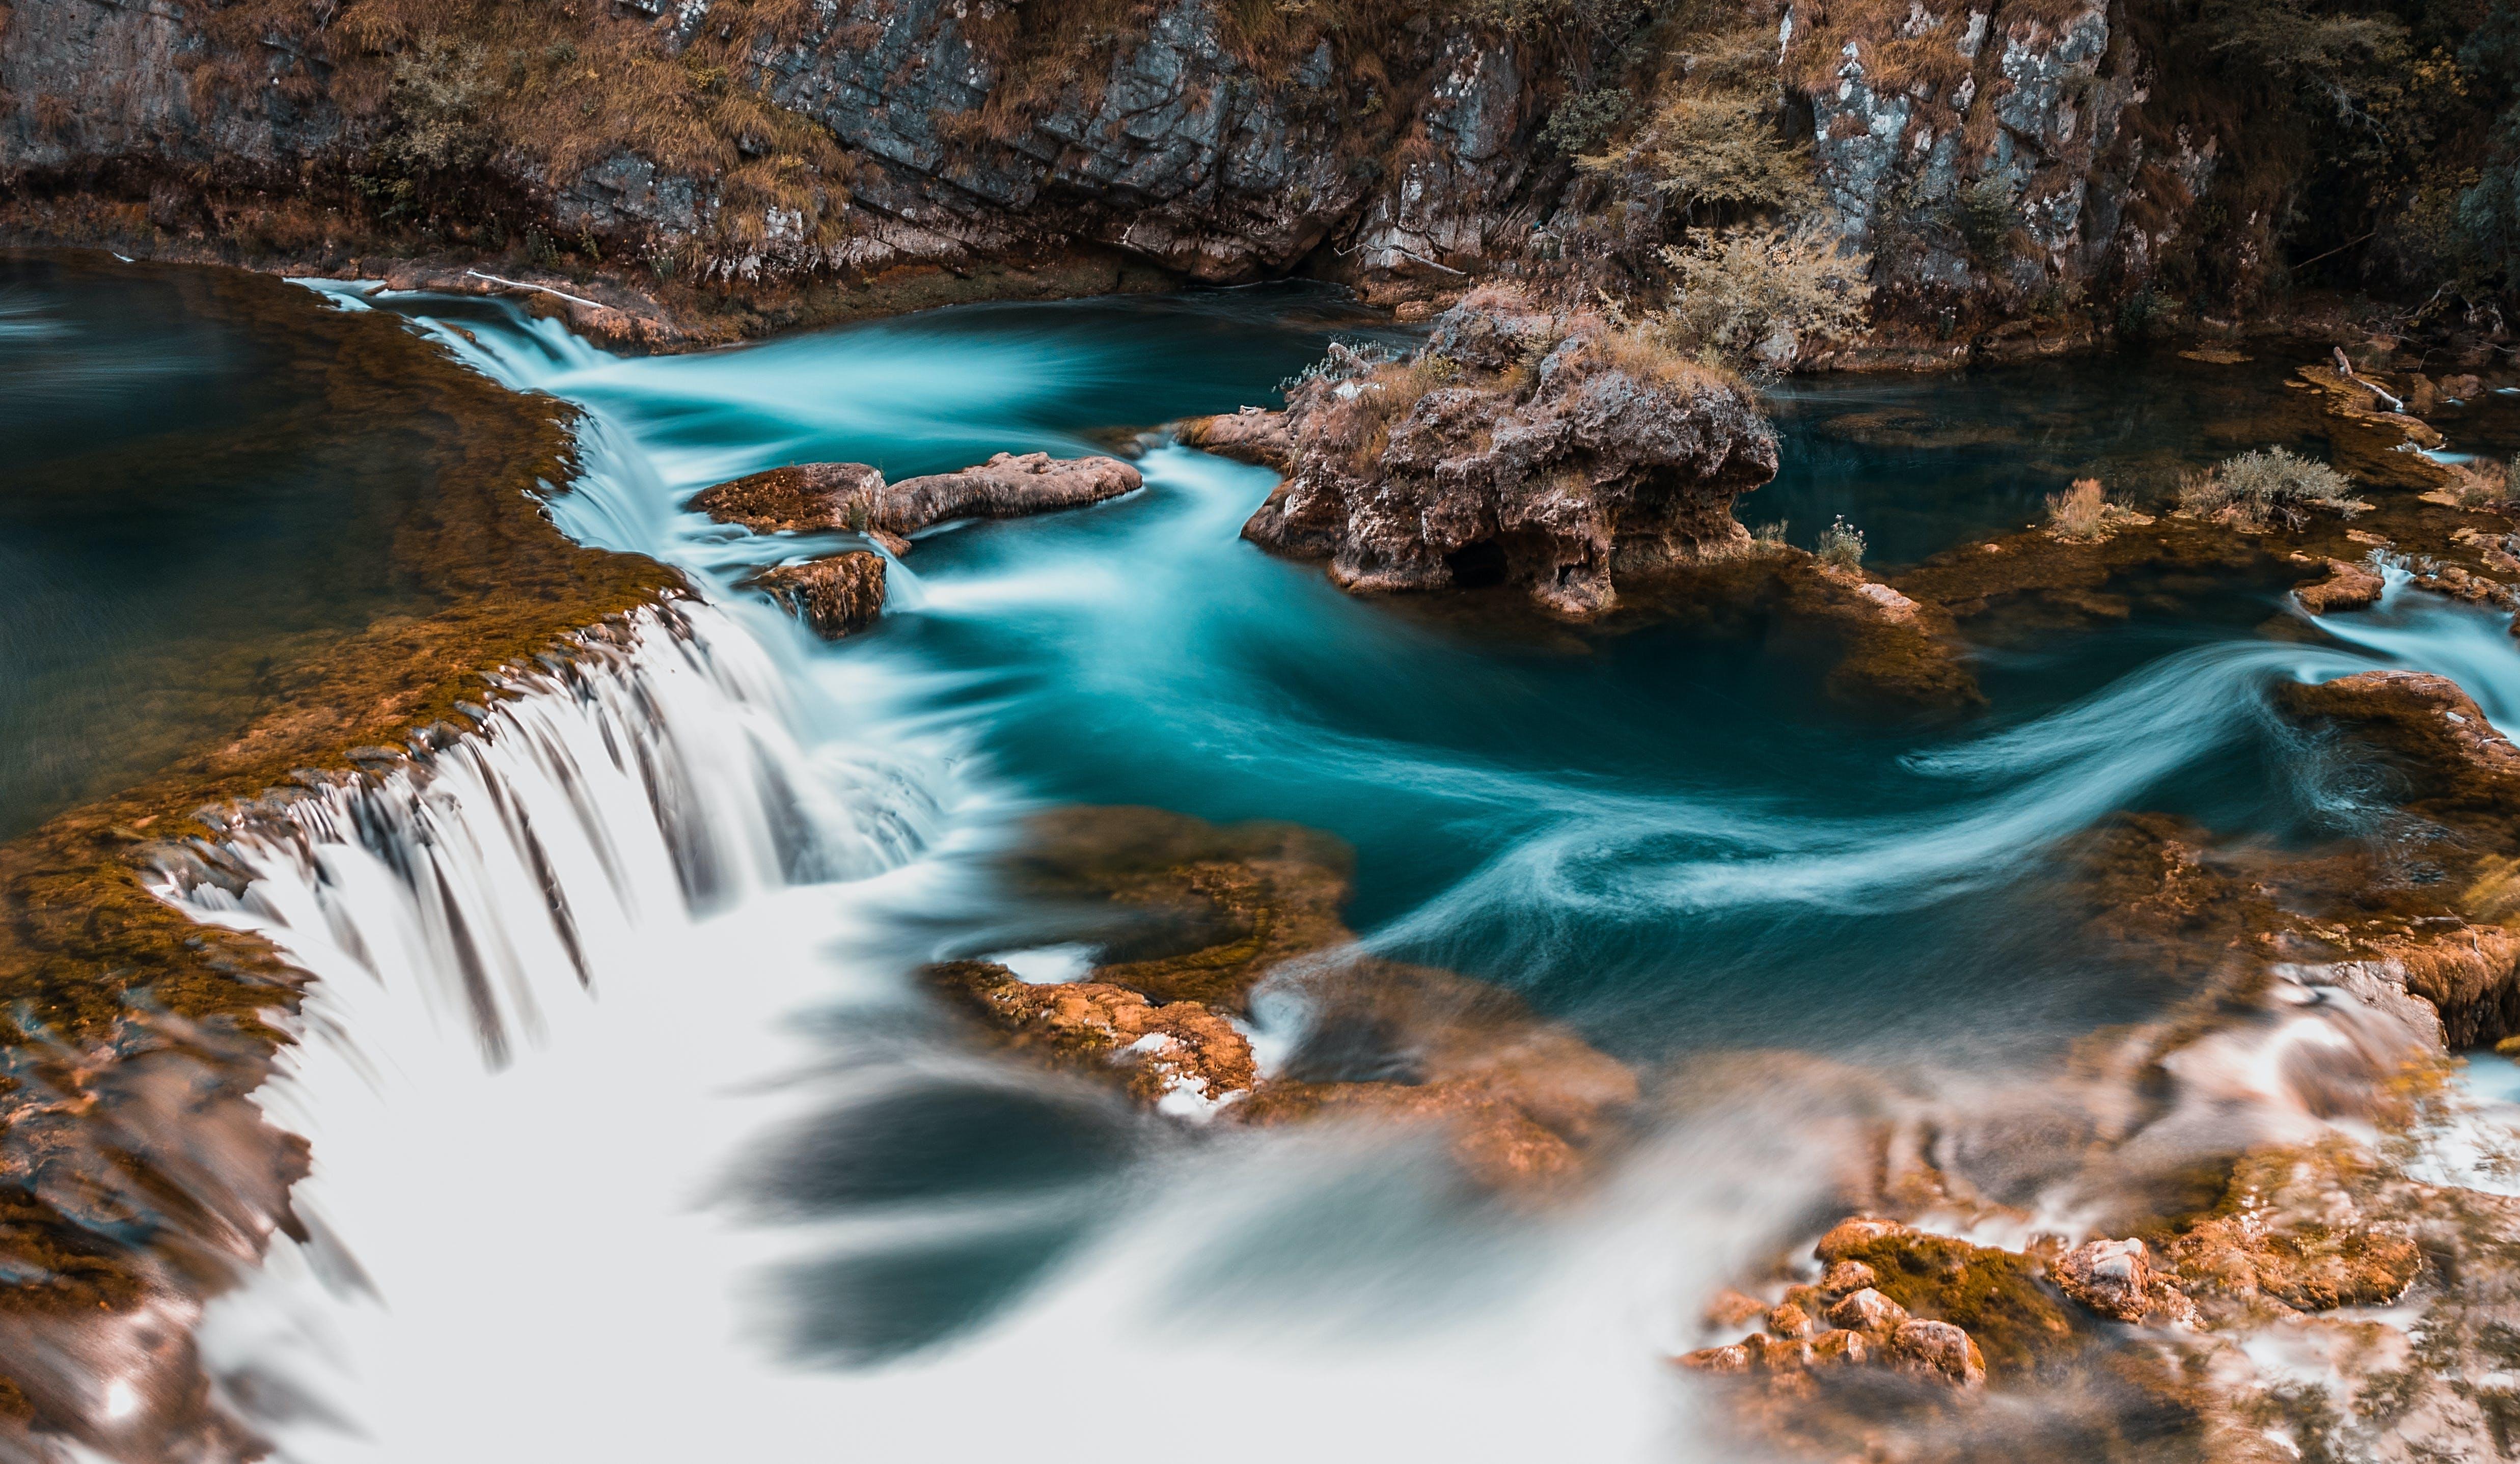 creek, environment, flow